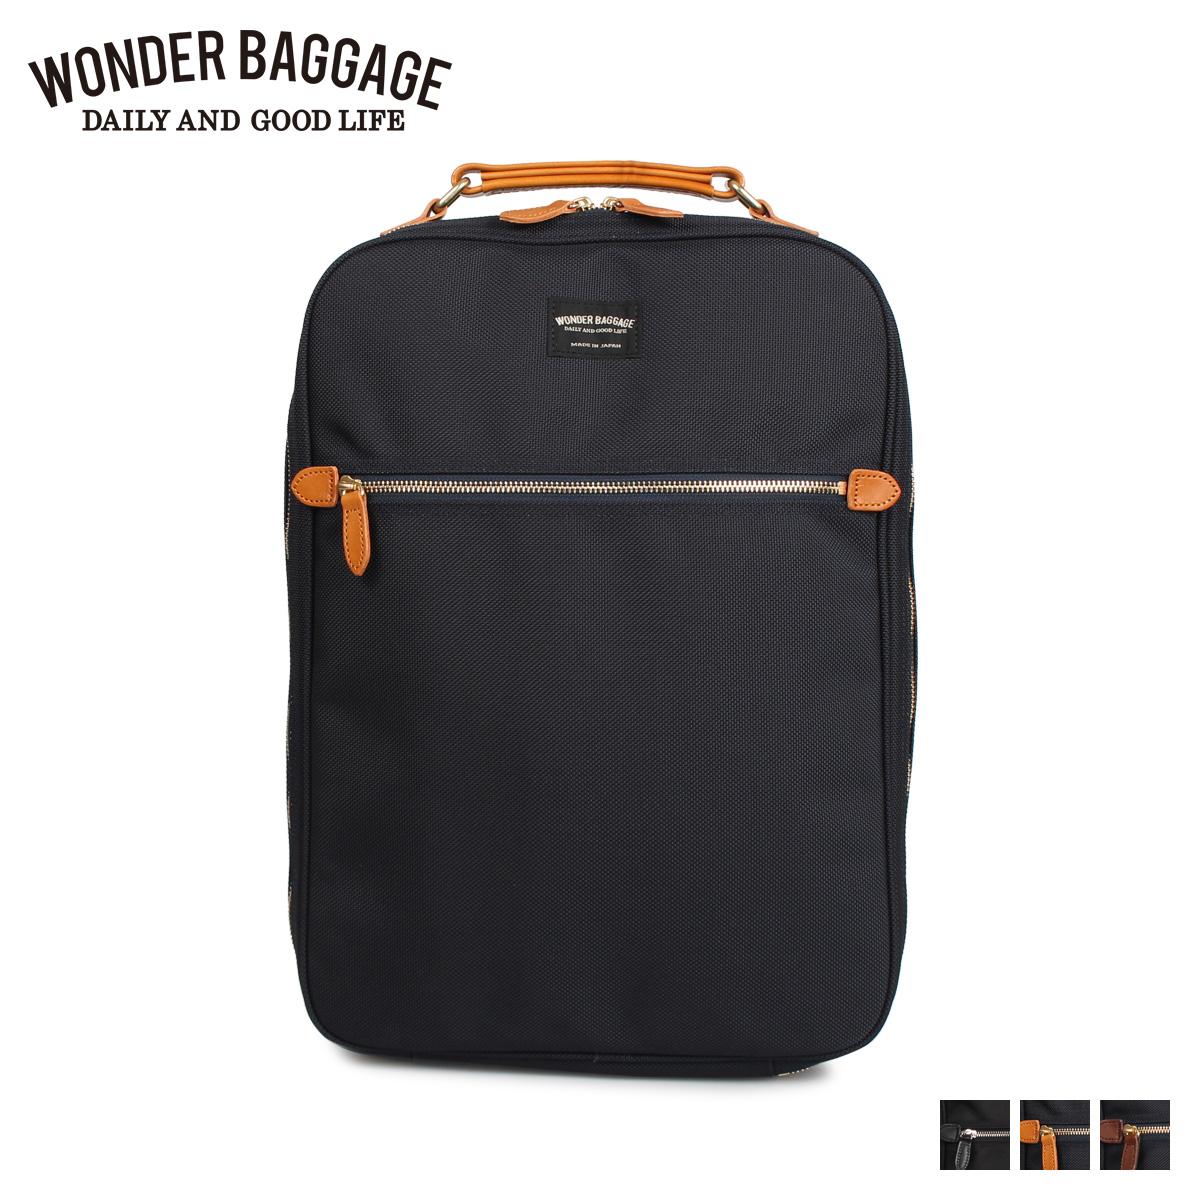 WONDER BAGGAGE ワンダーバゲージ MG ビジネスサック リュック バッグ バックパック メンズ レディース MG BUSINESS SACK ブラック ネイビー 黒 WB-G-026